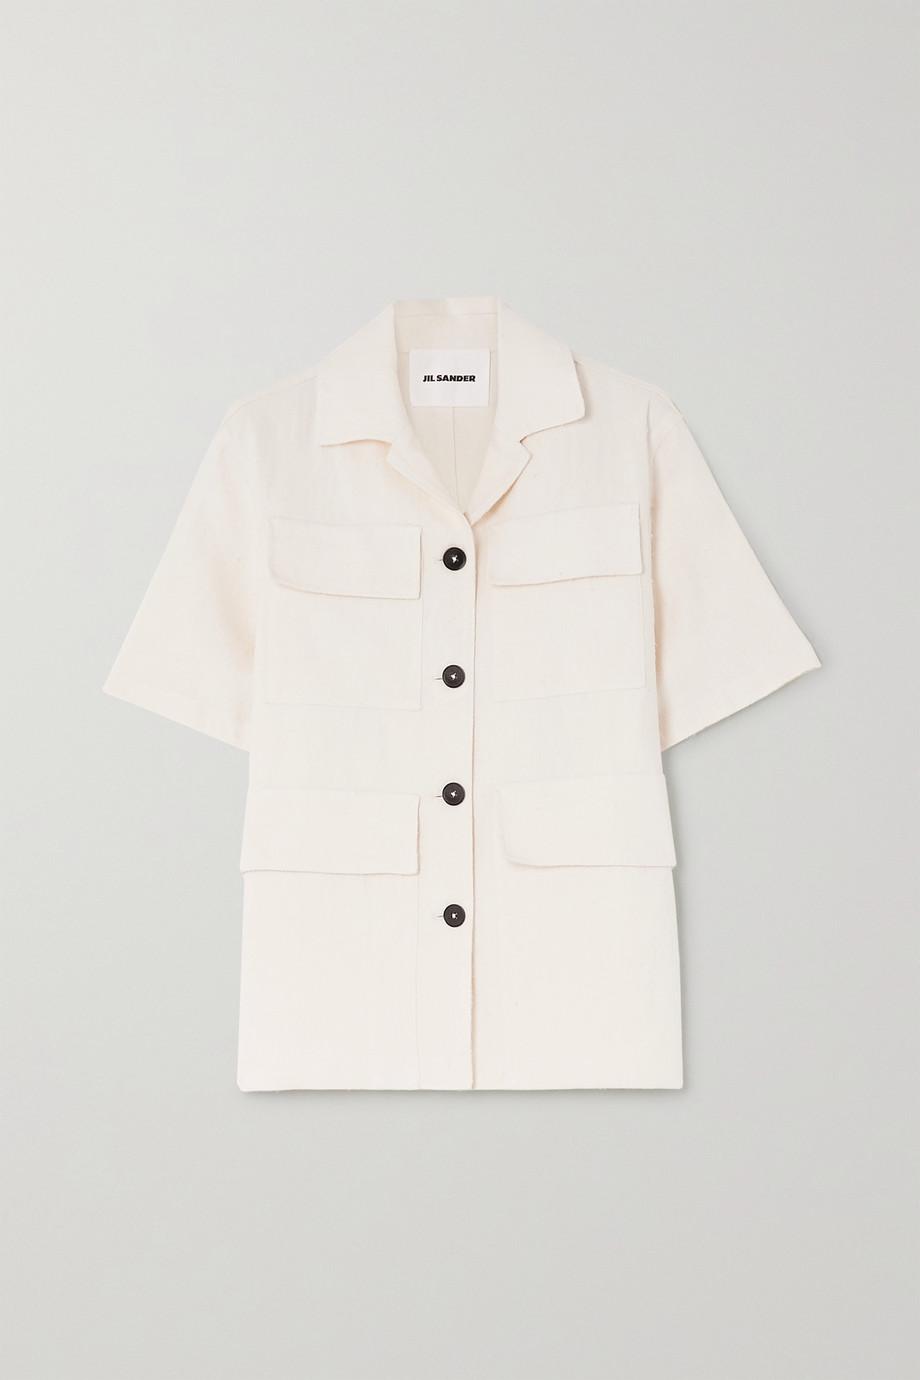 Jil Sander Silk, ramie and hemp-blend canvas shirt